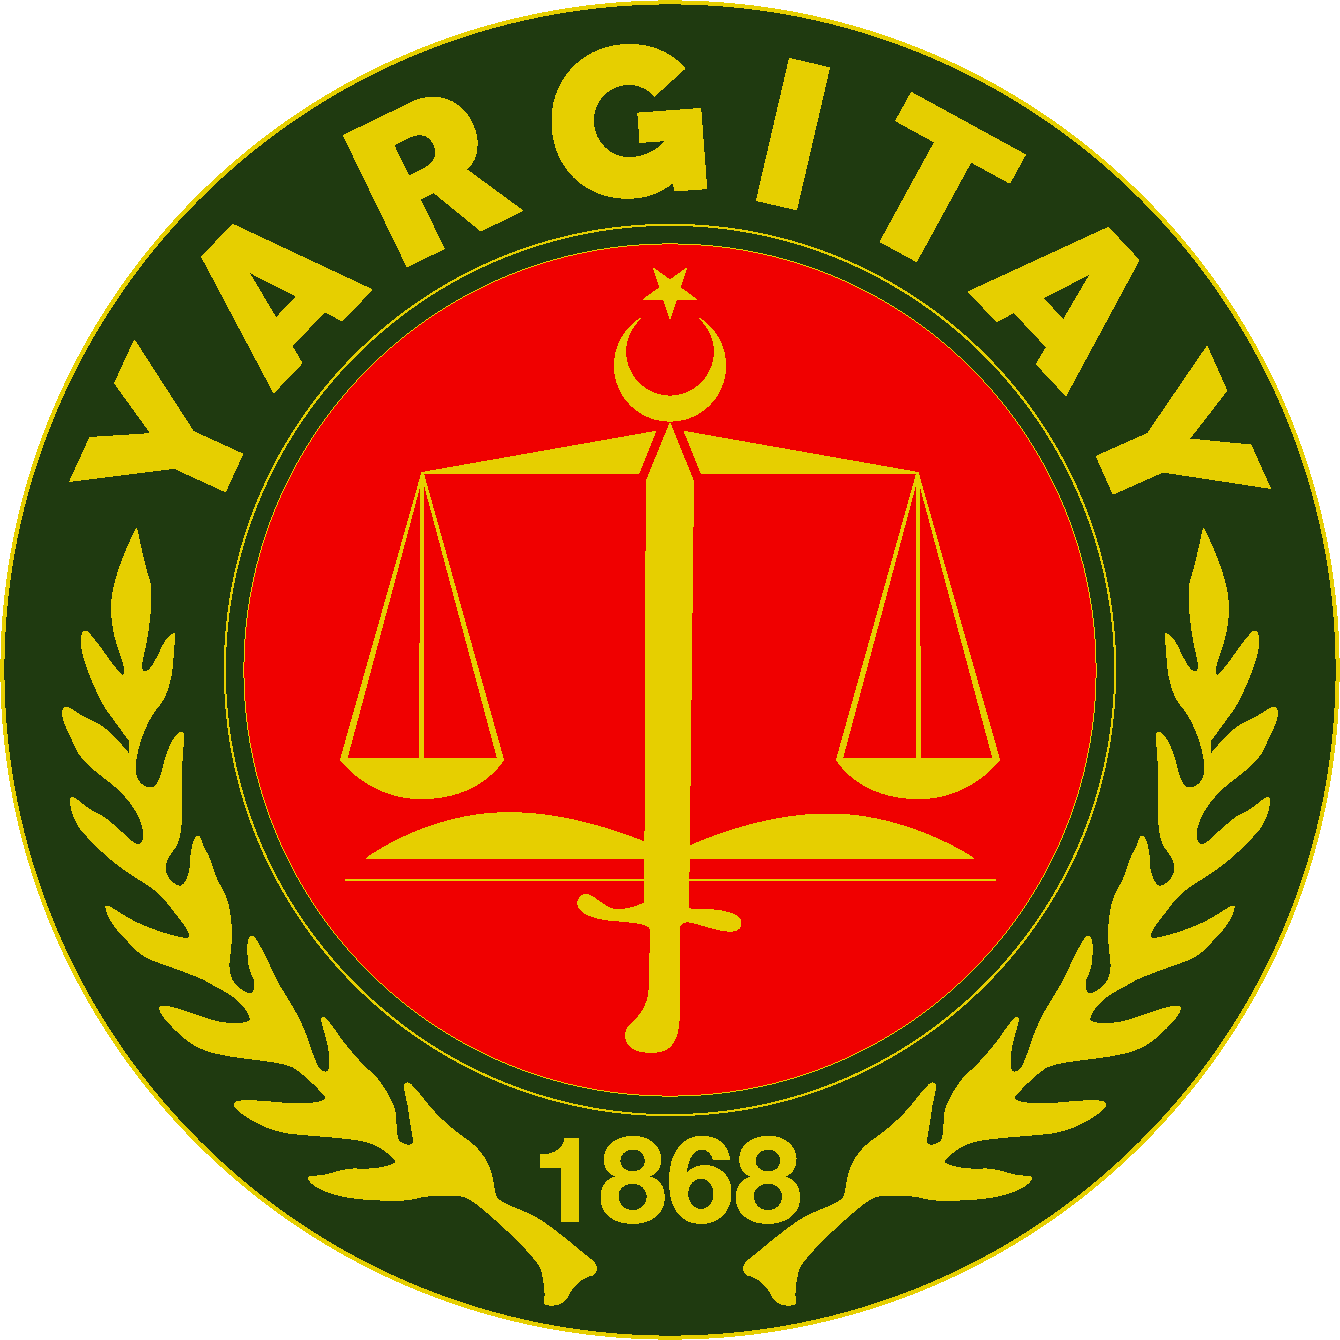 Yargıtay Logo png